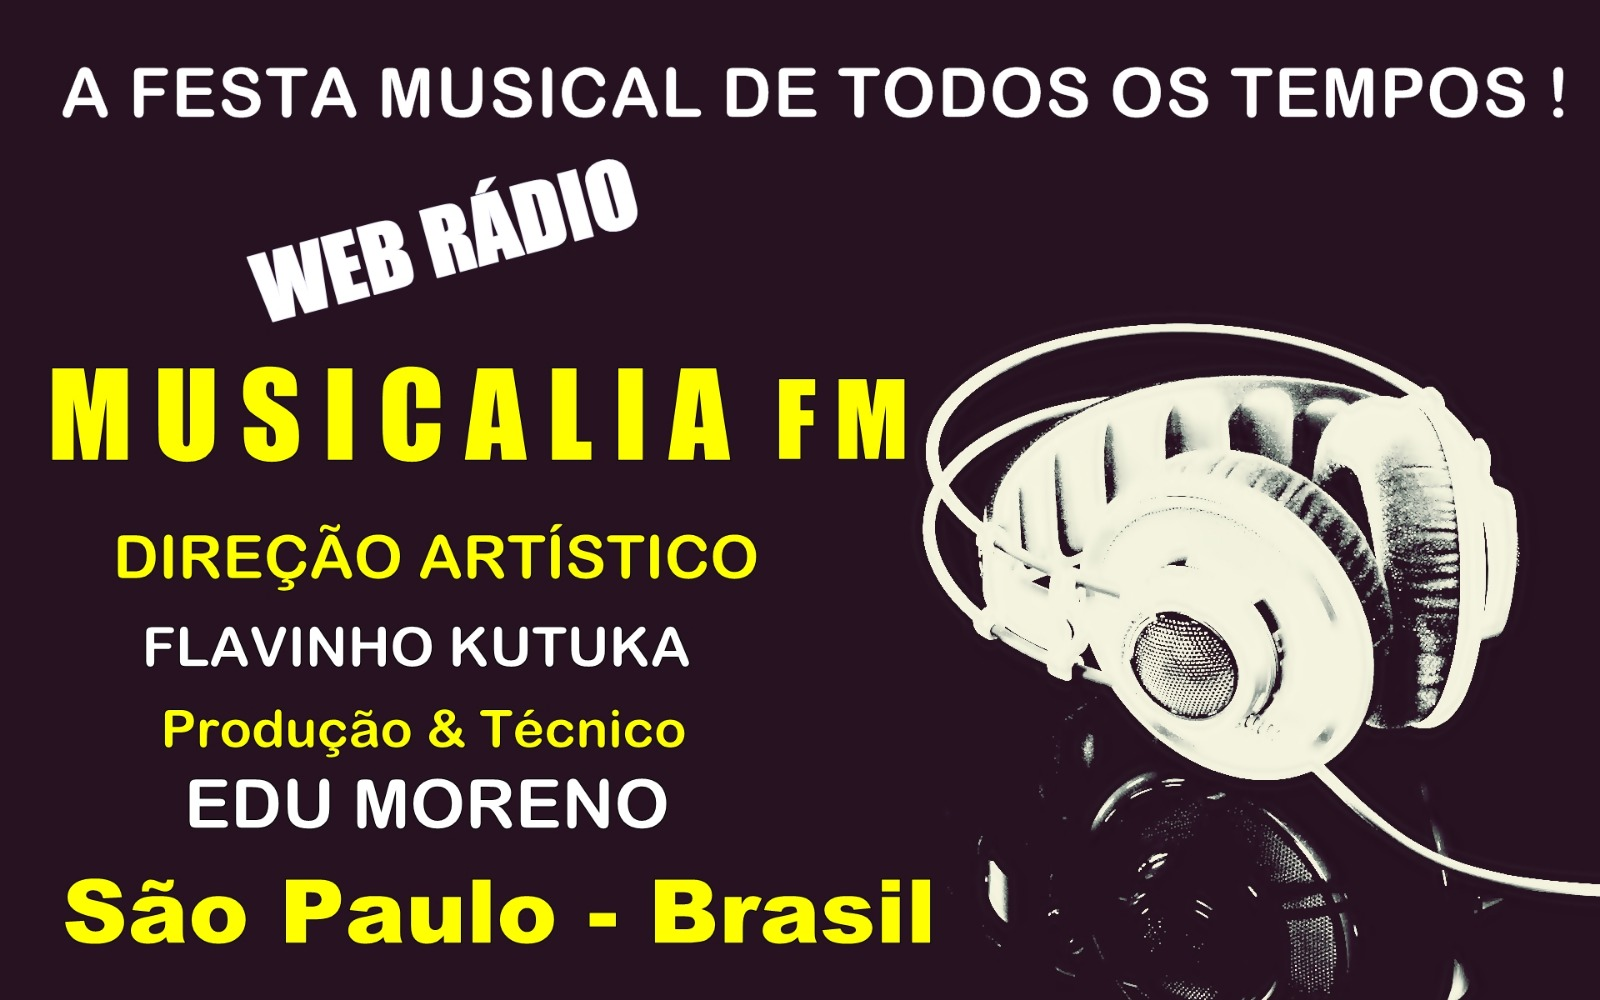 MUSICALIA WEB RADIO